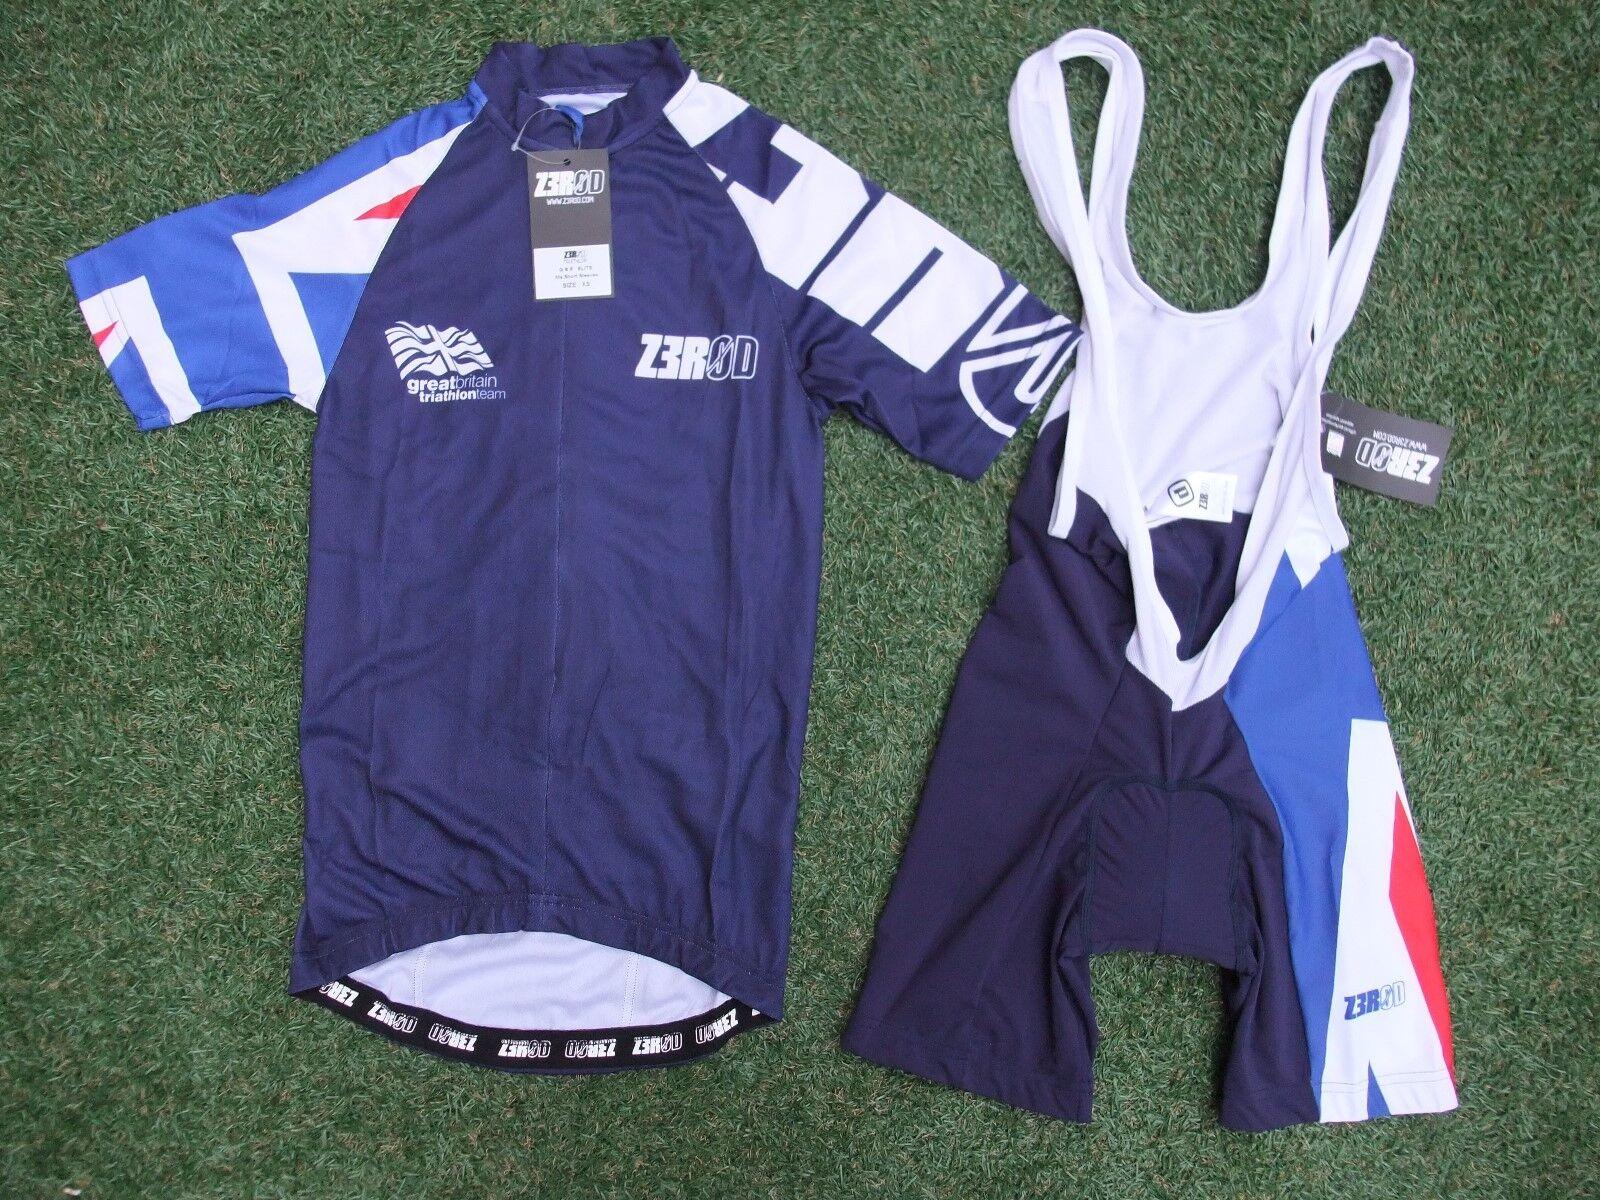 BNWT Z3ROD GBR Age Group British Triathlon Team Cycling Bib Shorts & Jersey  XS